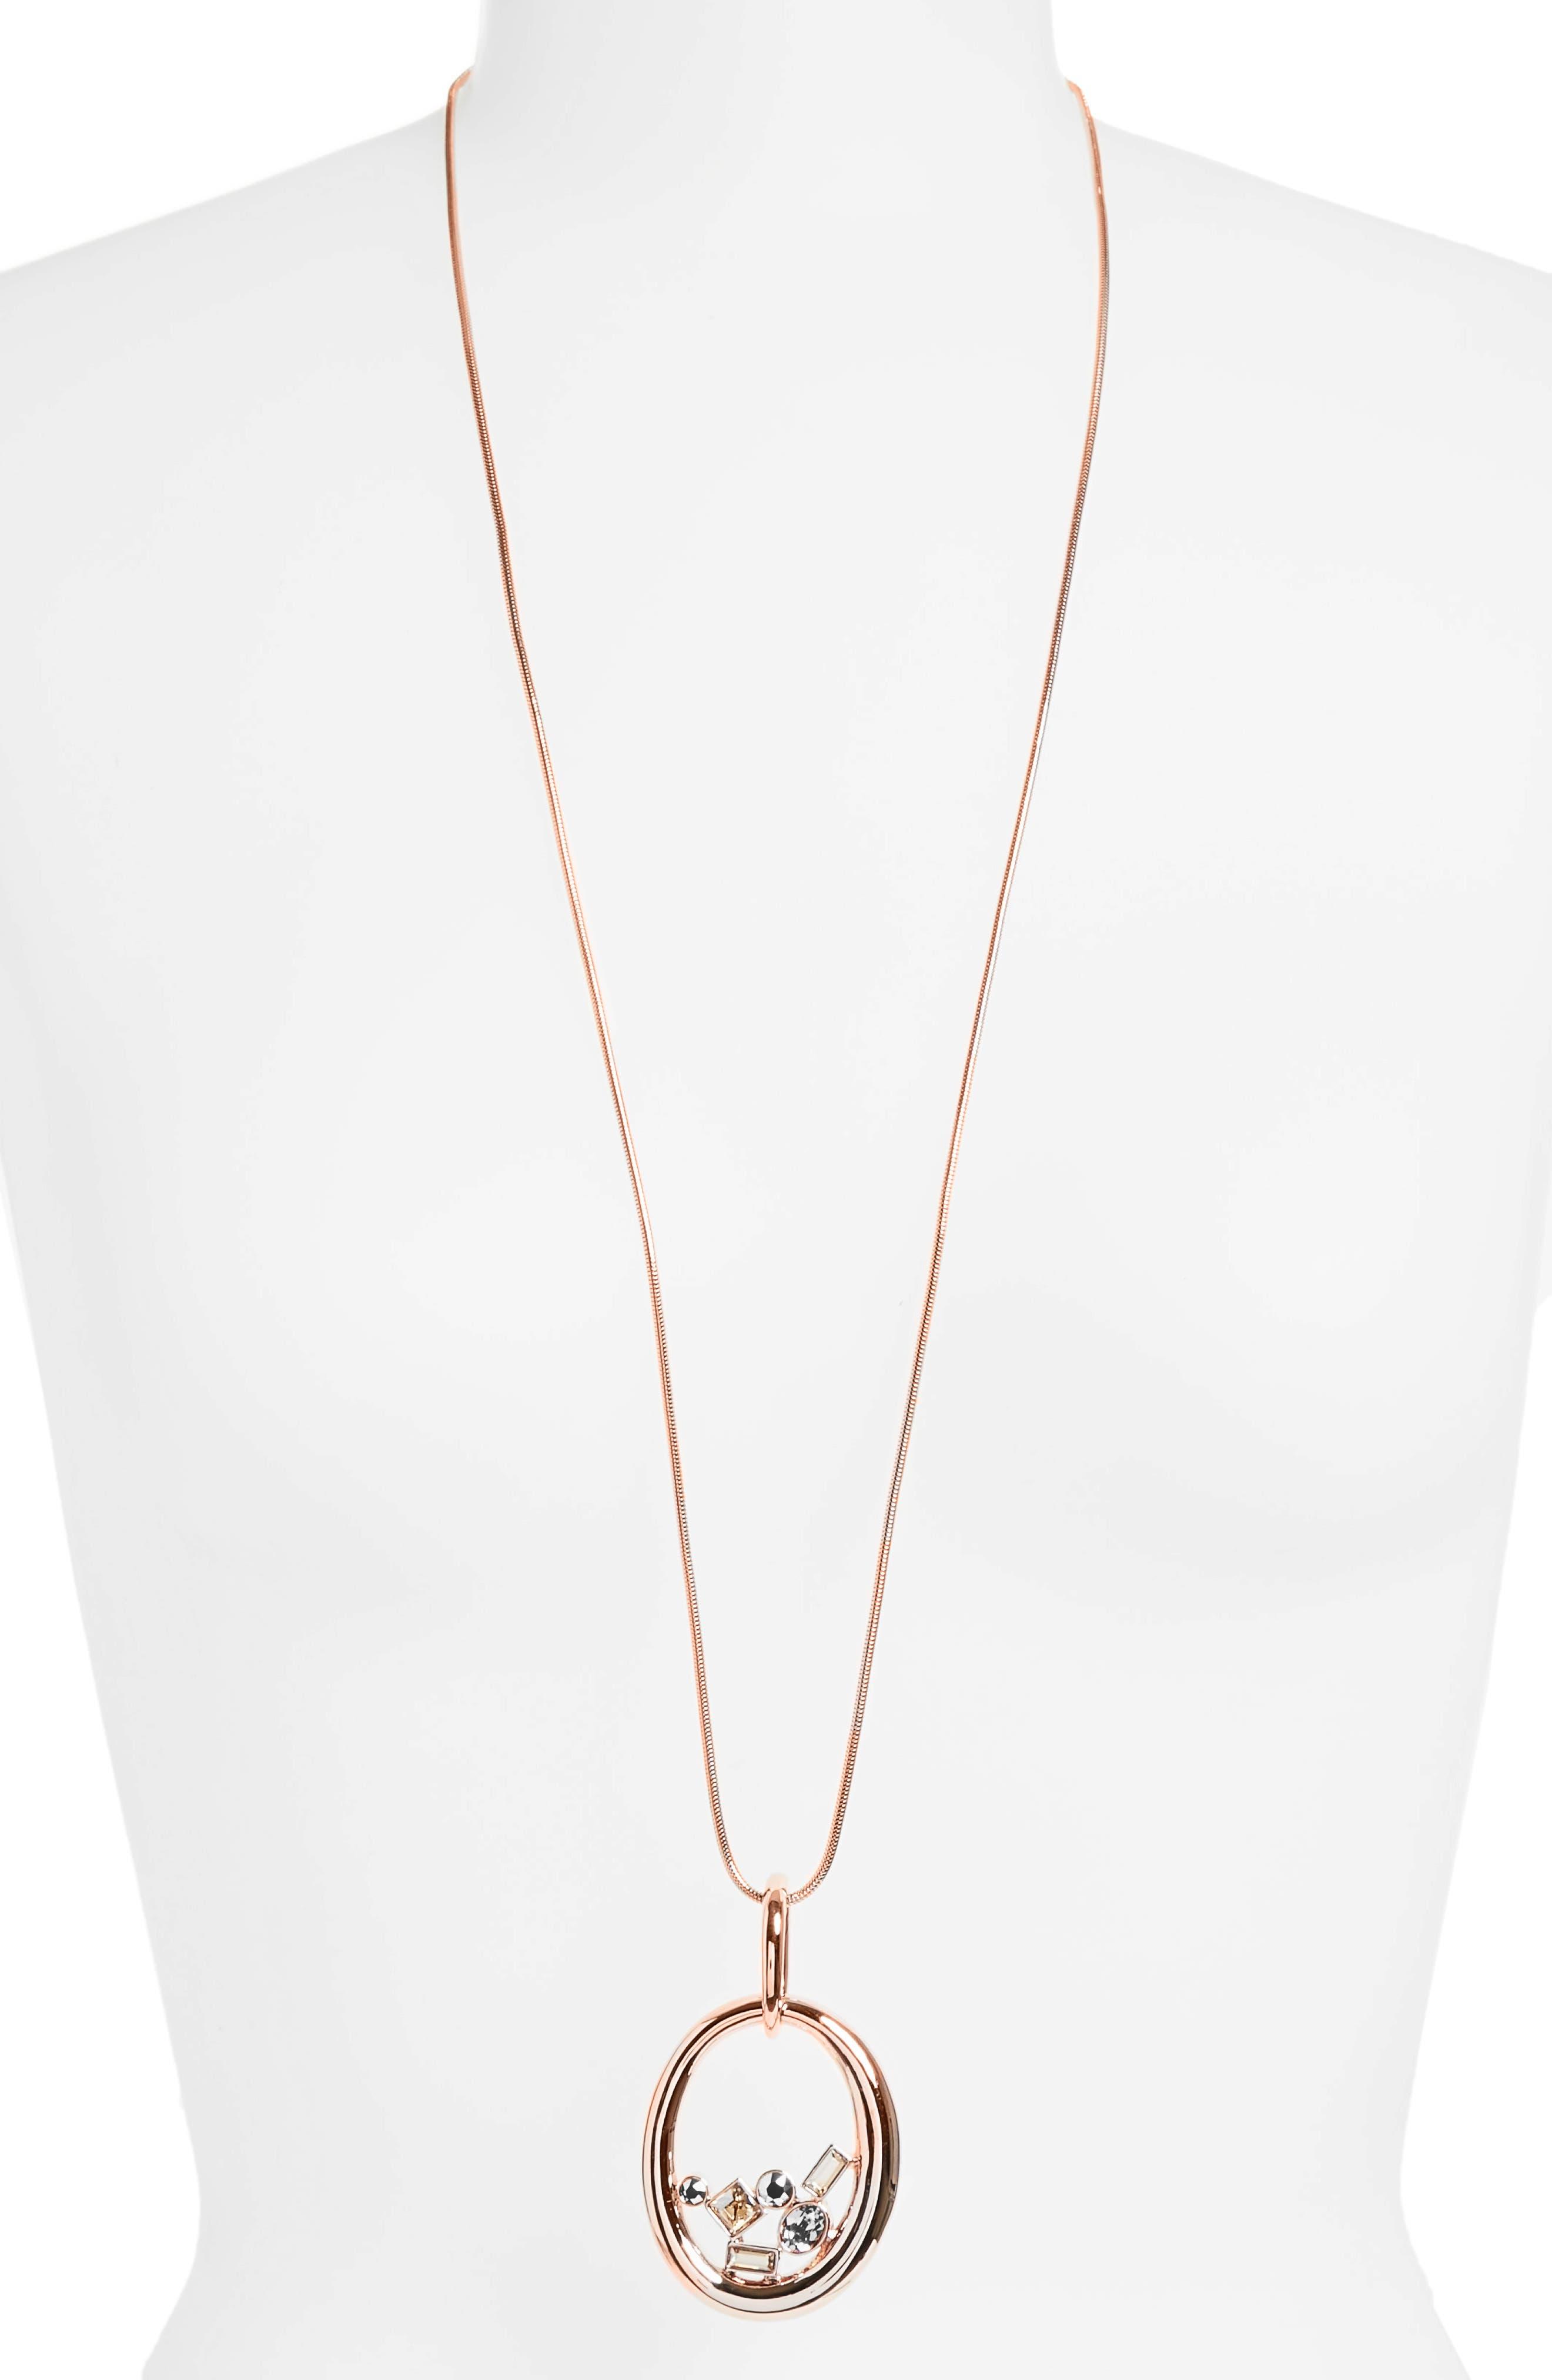 Swarovski Crystal Oval Pendant,                             Alternate thumbnail 2, color,                             CRYSTAL ROSE GOLD/ ROSE